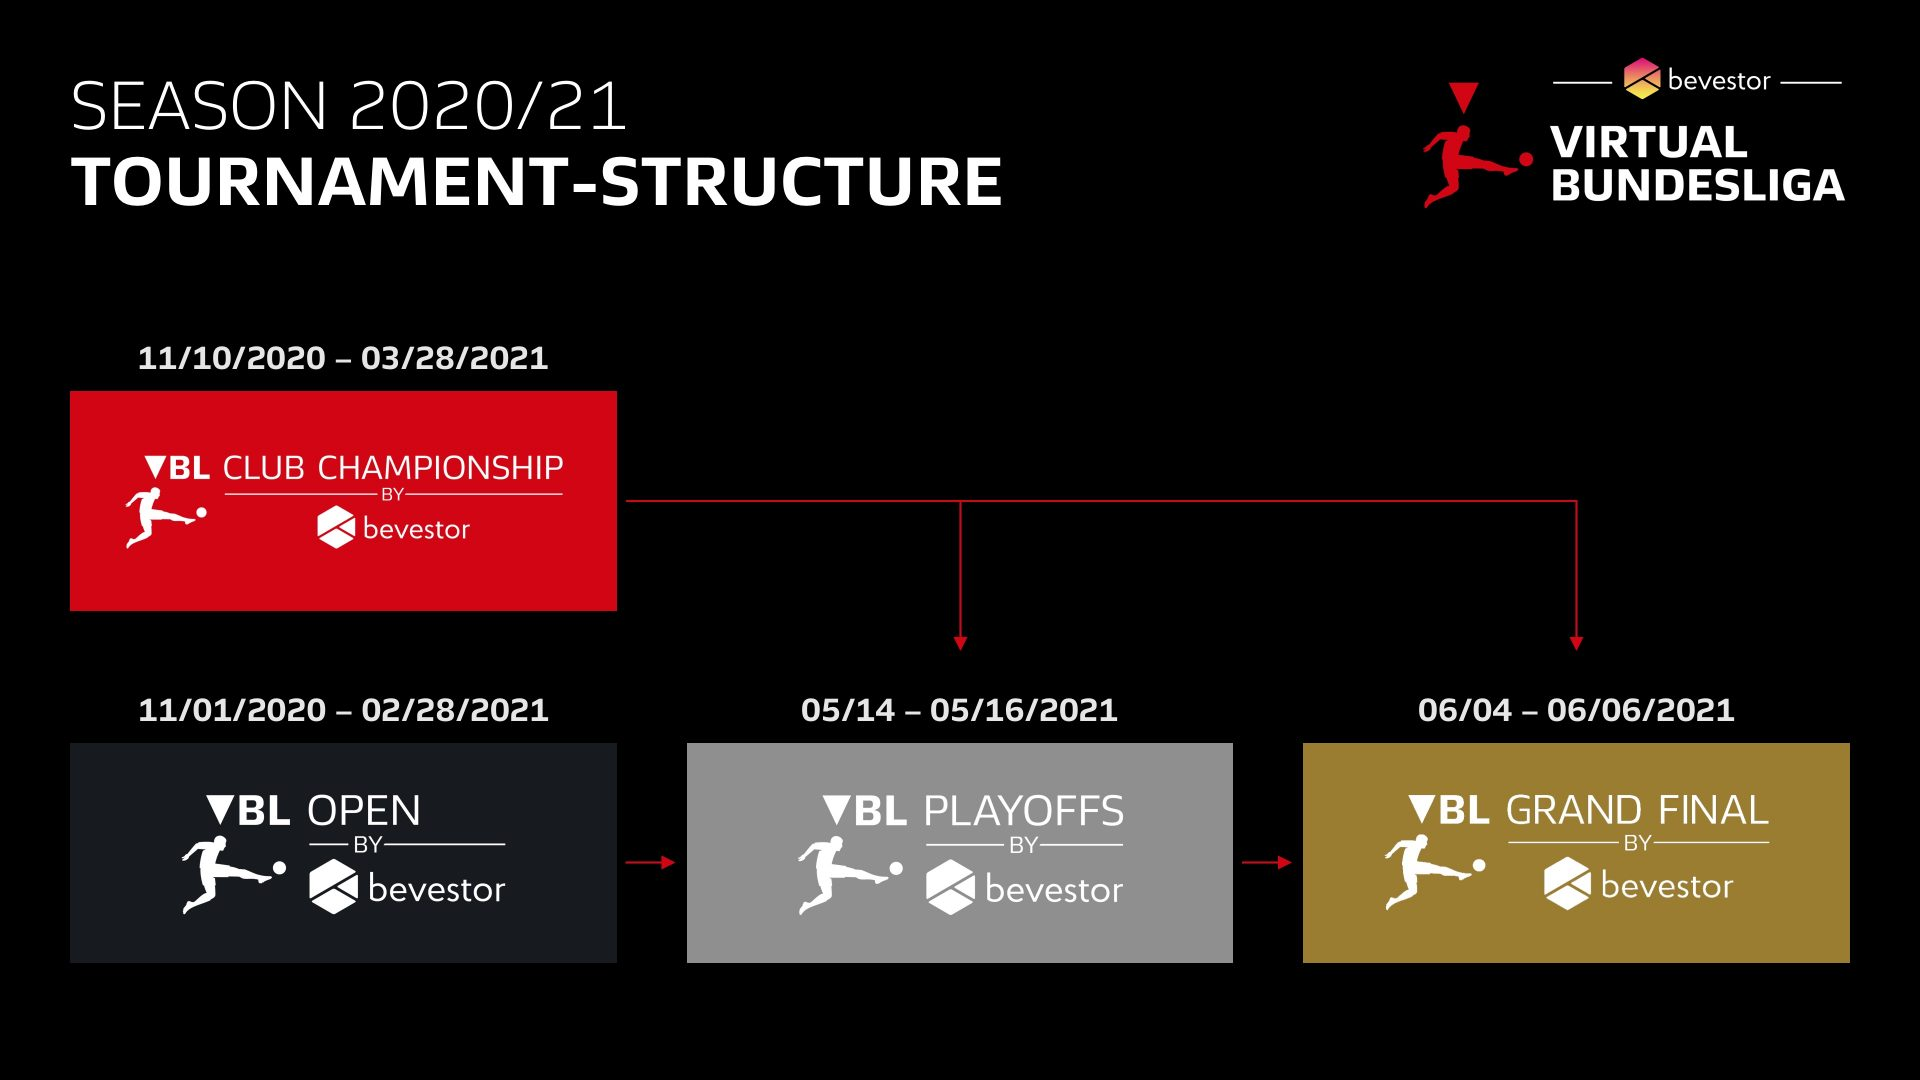 bevestor Virtual Bundesliga - Tournament Structure